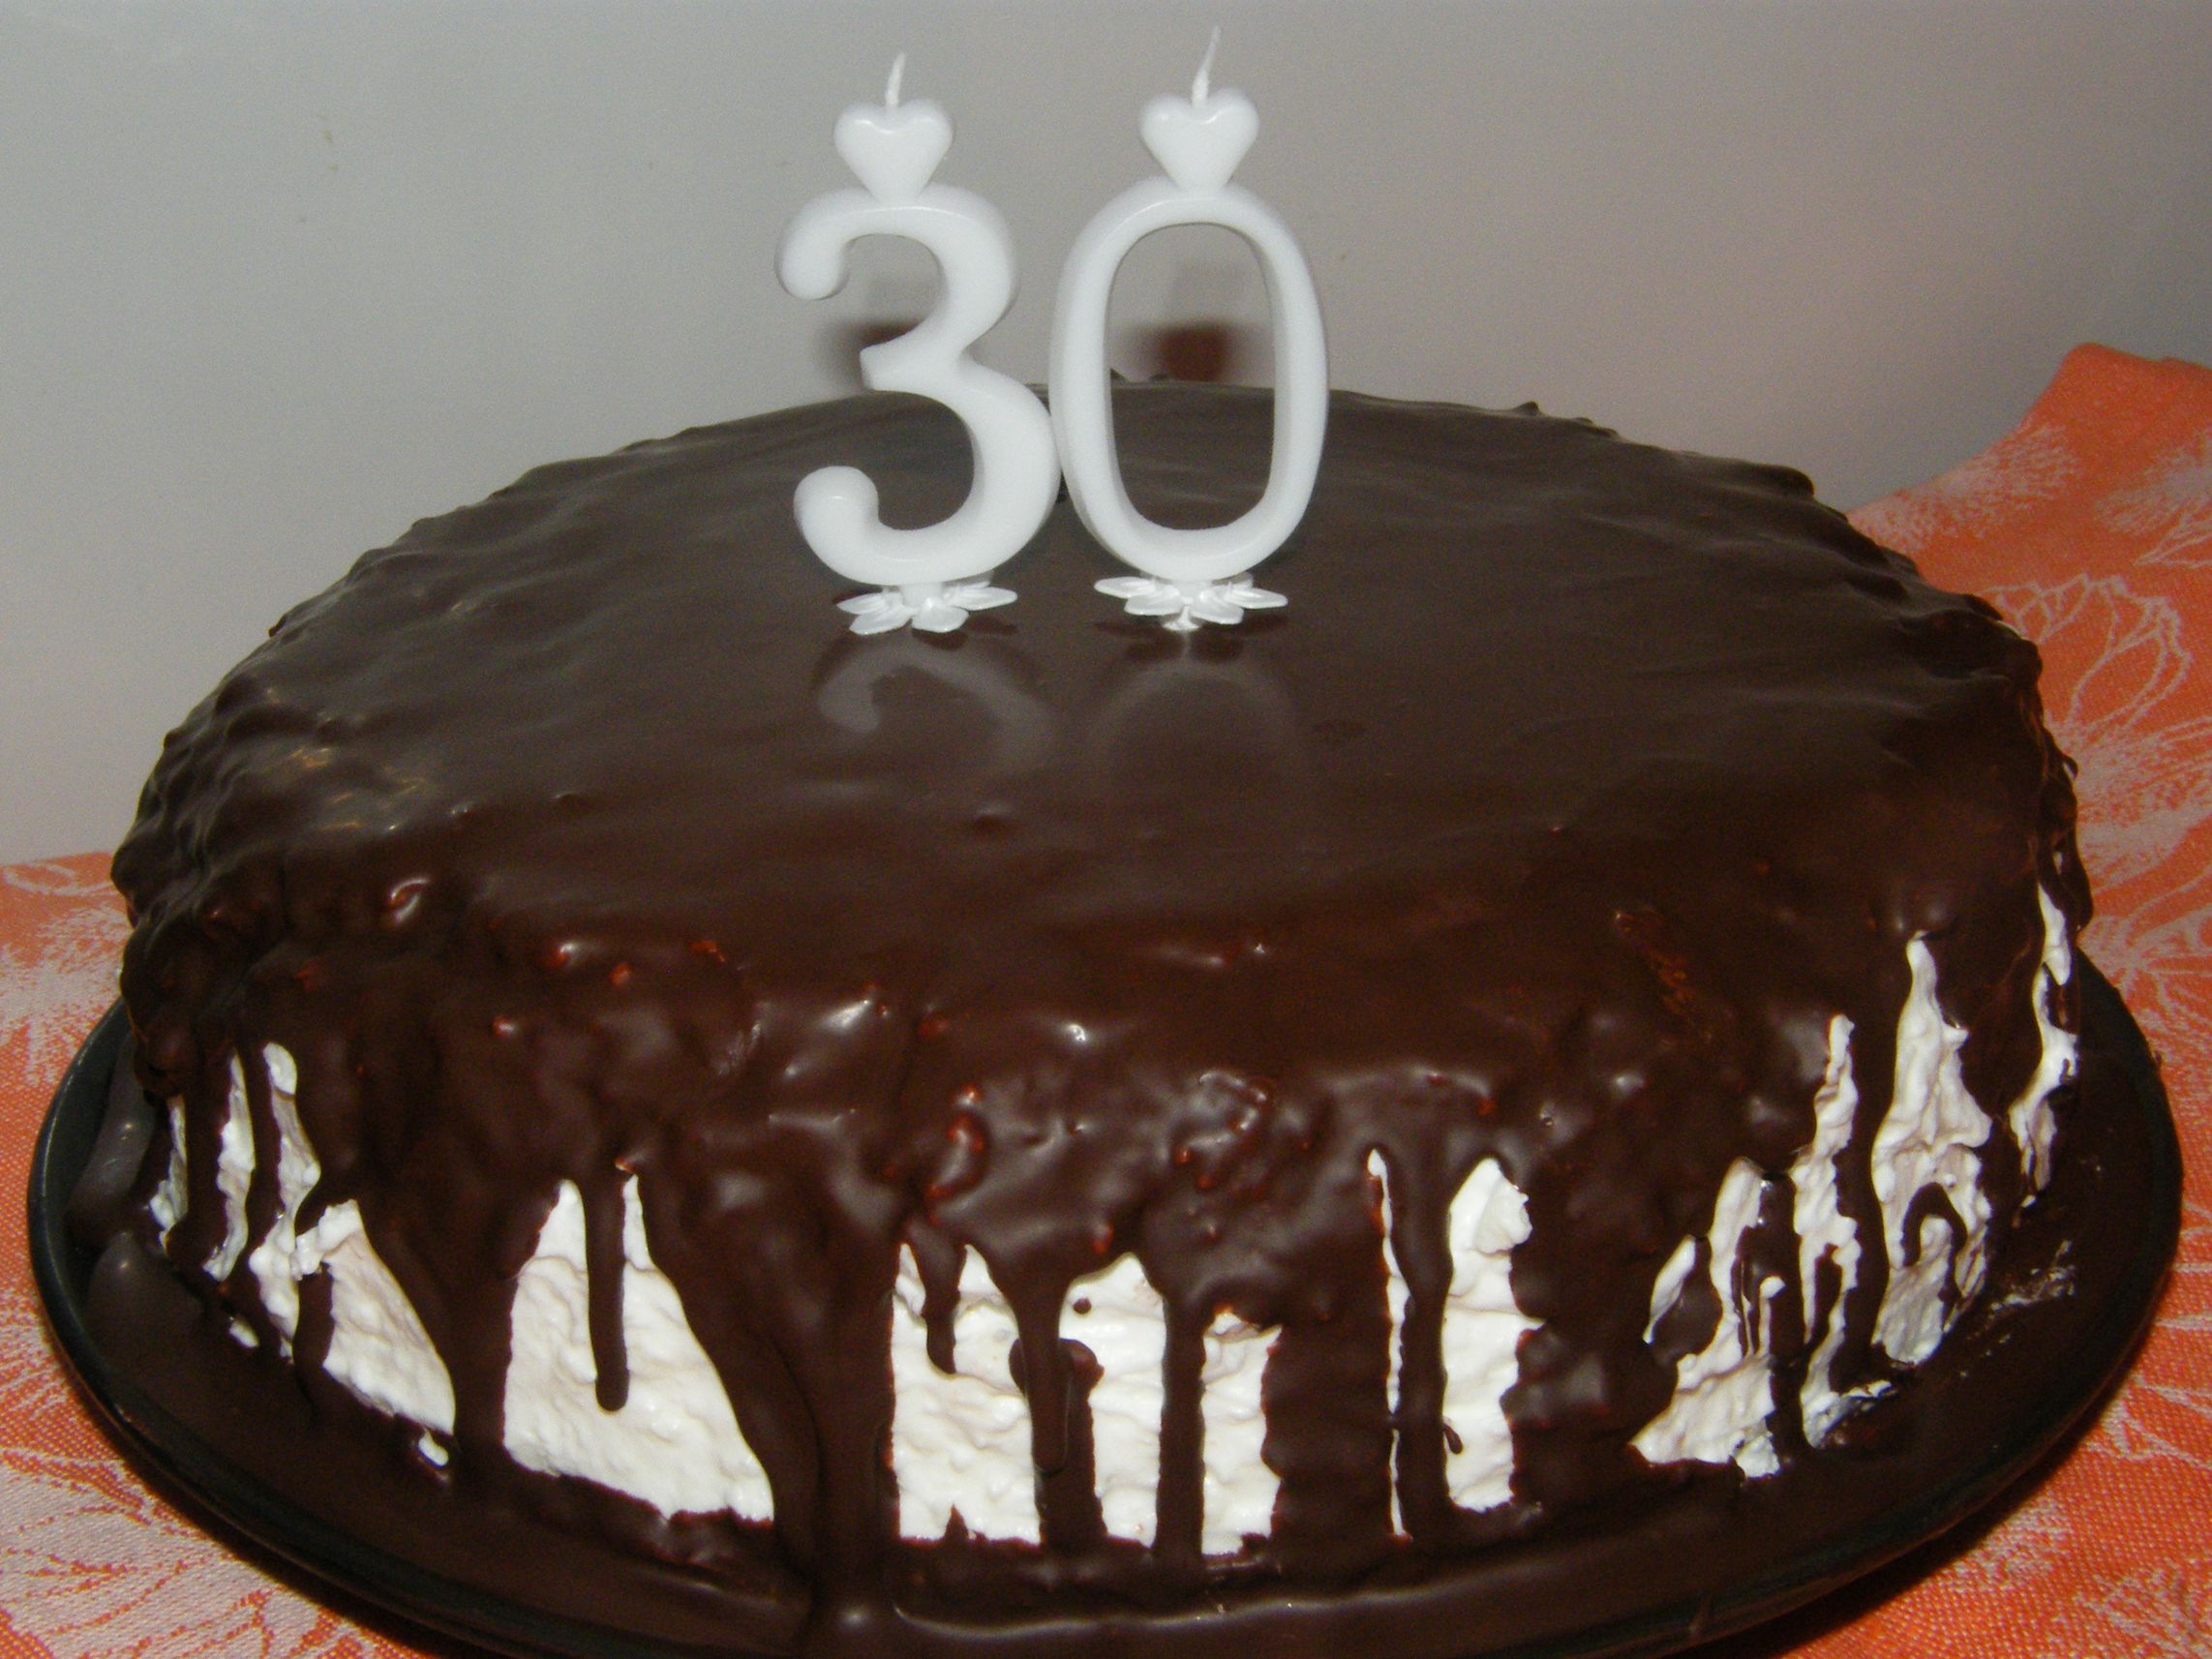 turo_rudi_torta_4_.JPG